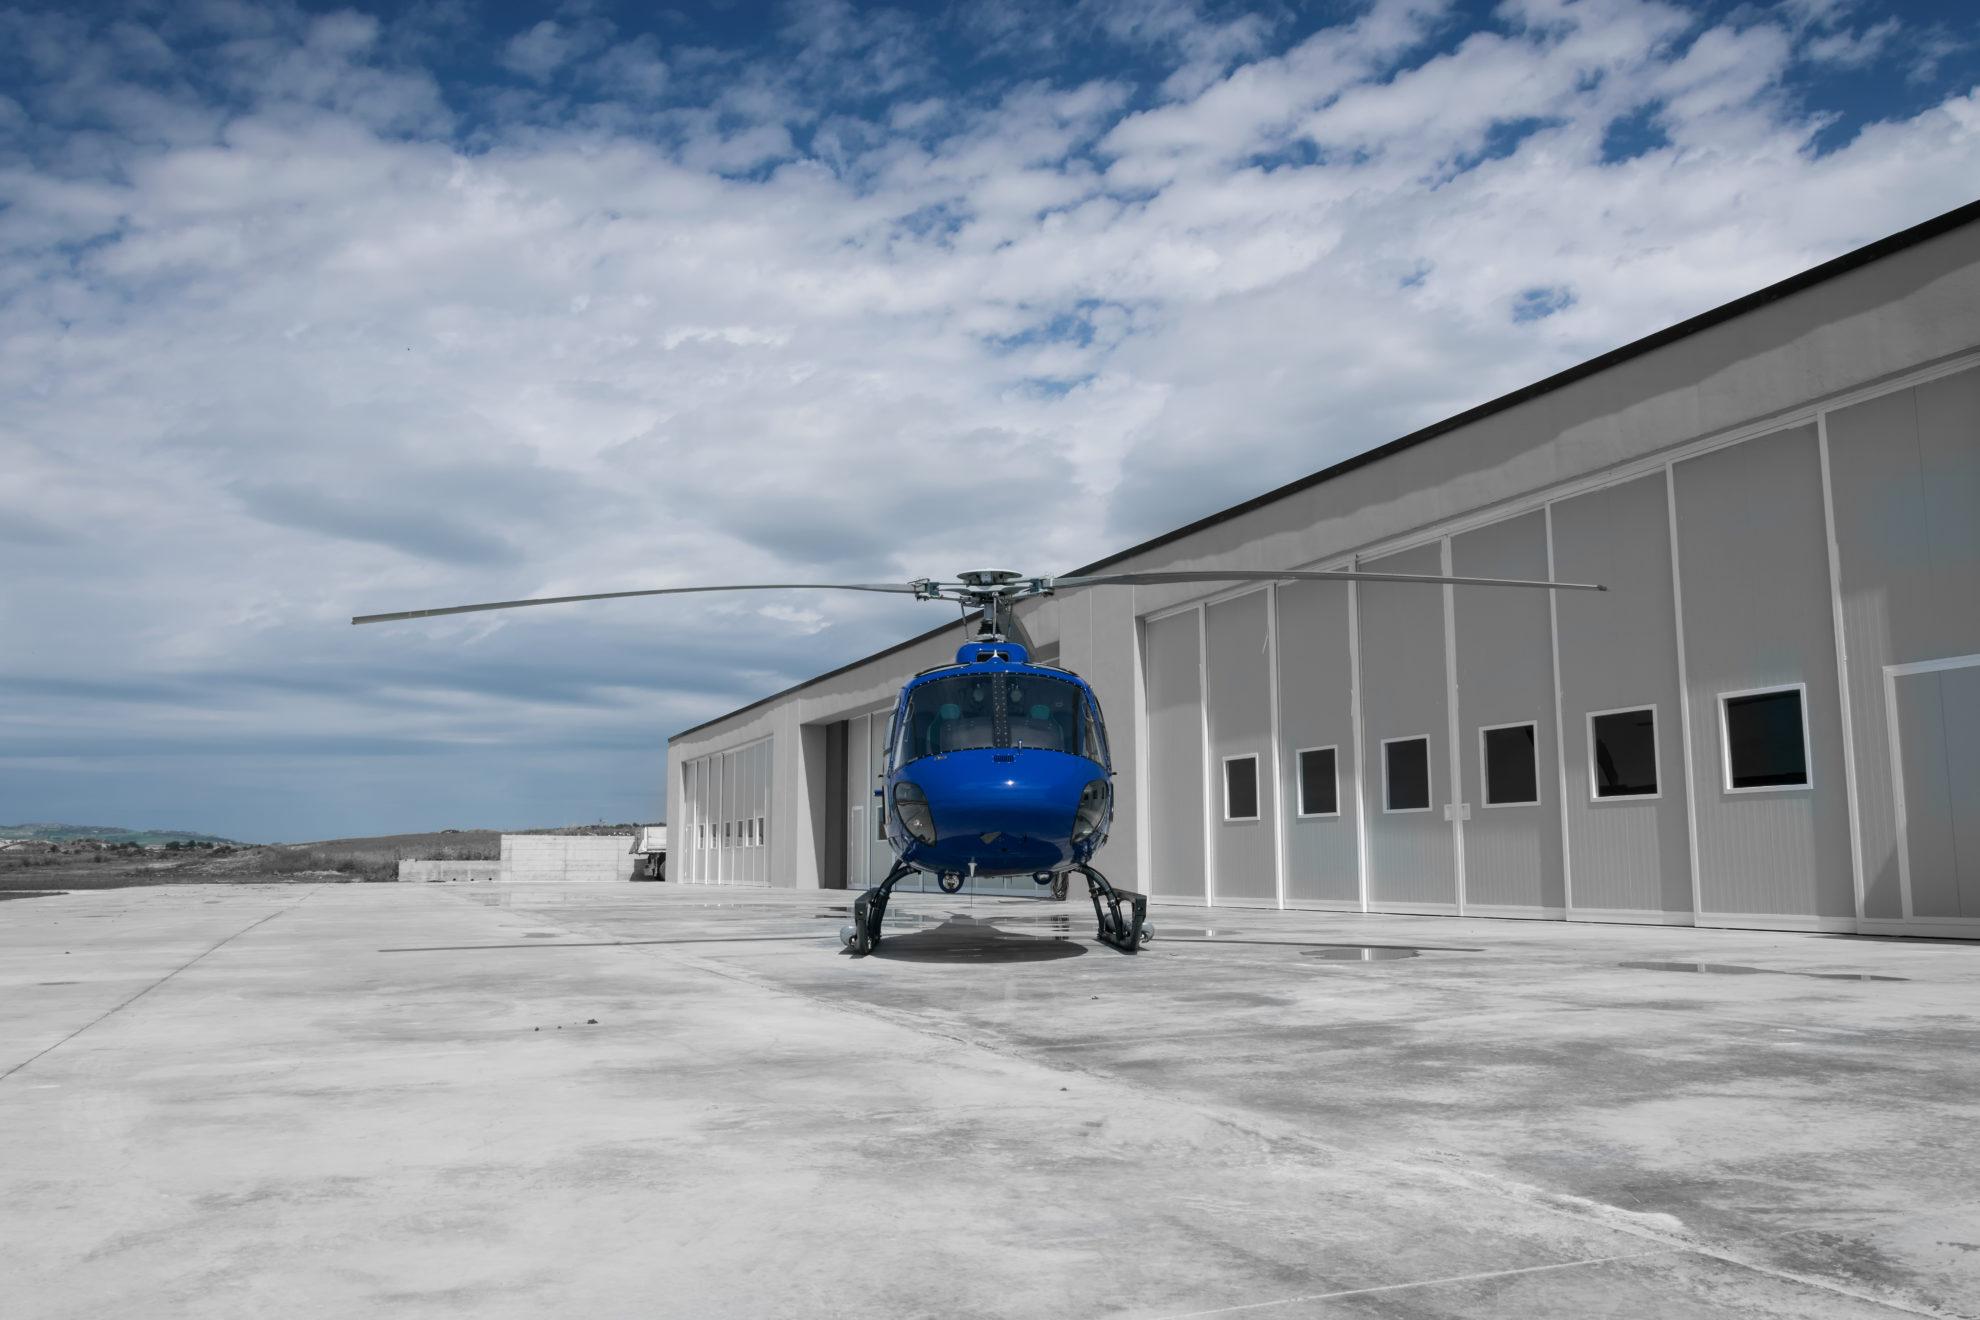 Noleggio elicotteri prezzo